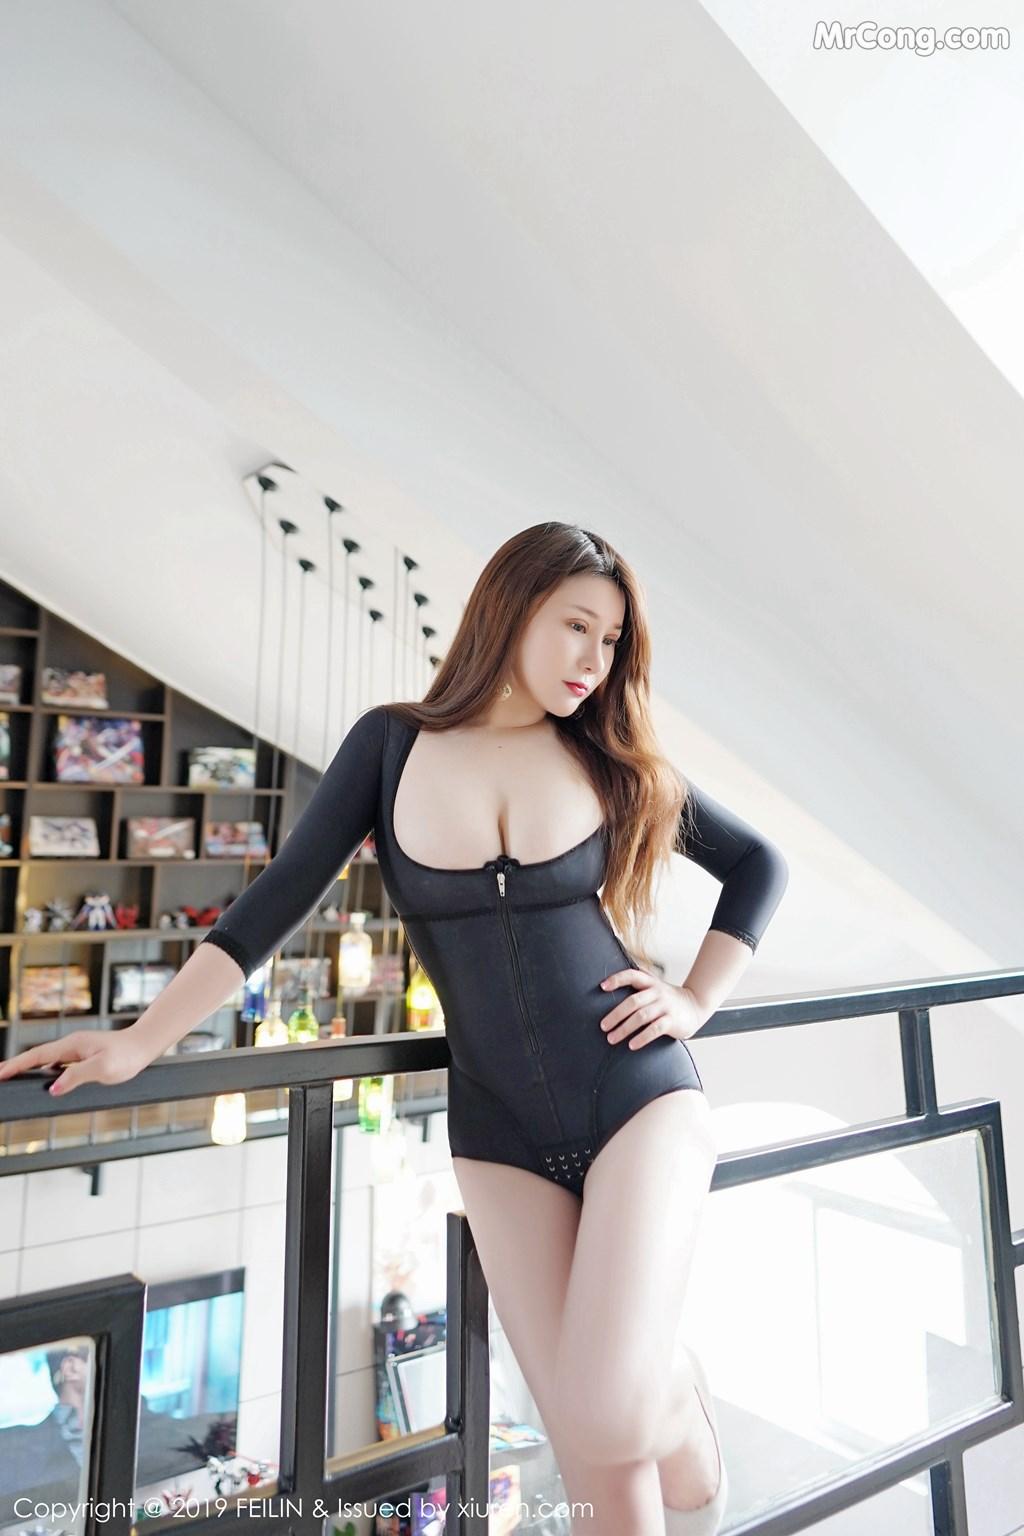 FEILIN Vol.208: 李清婳 (42P)